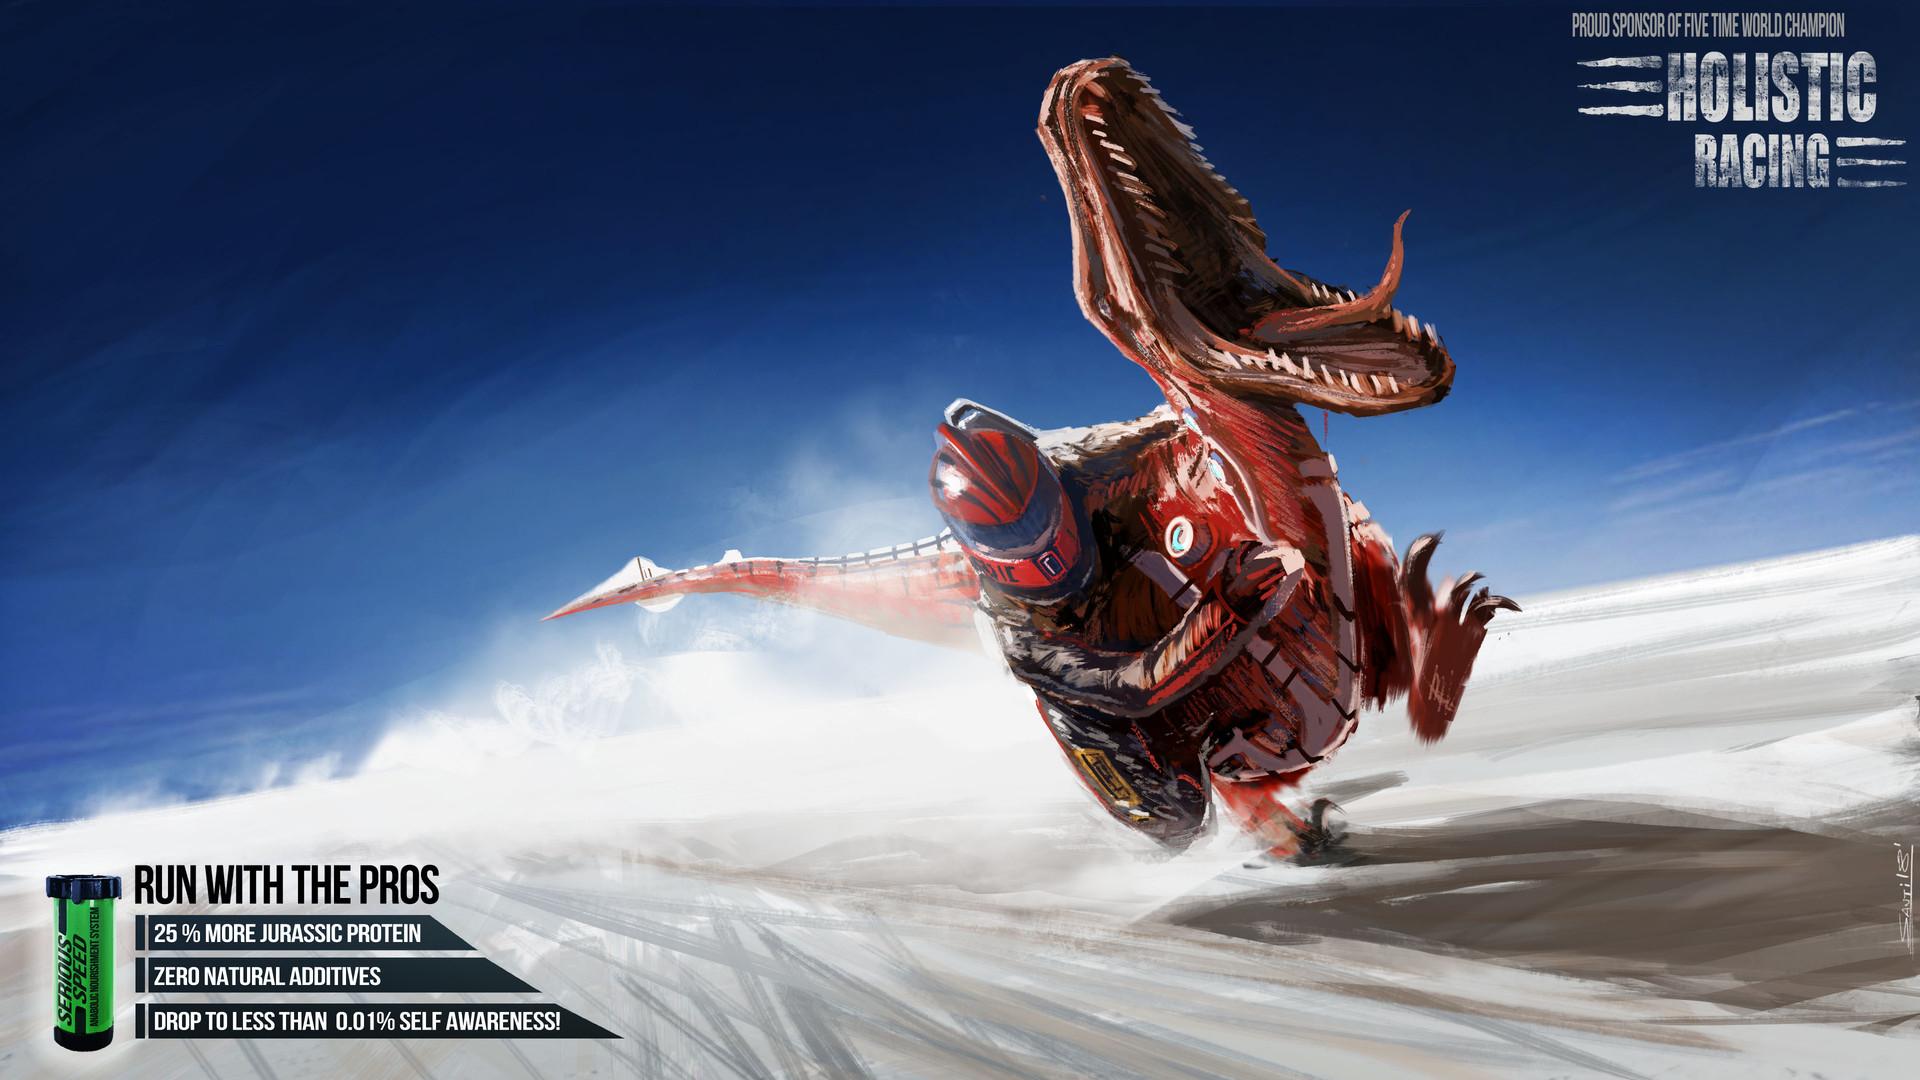 Santiago fuentes racingraptor v001illustrtation